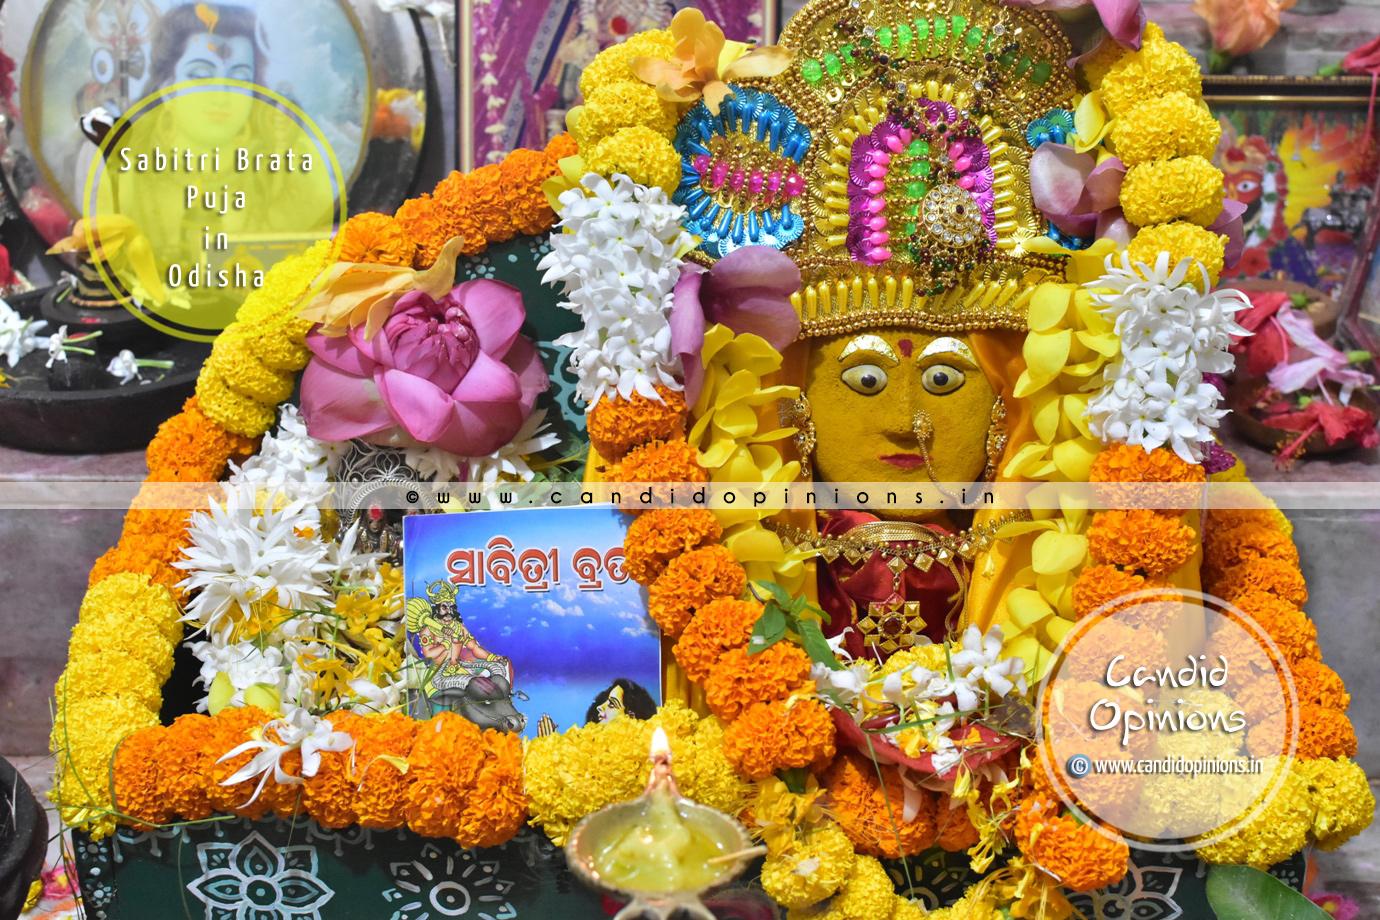 Sabitri Brata Puja (Savitri Vrat) In Odisha